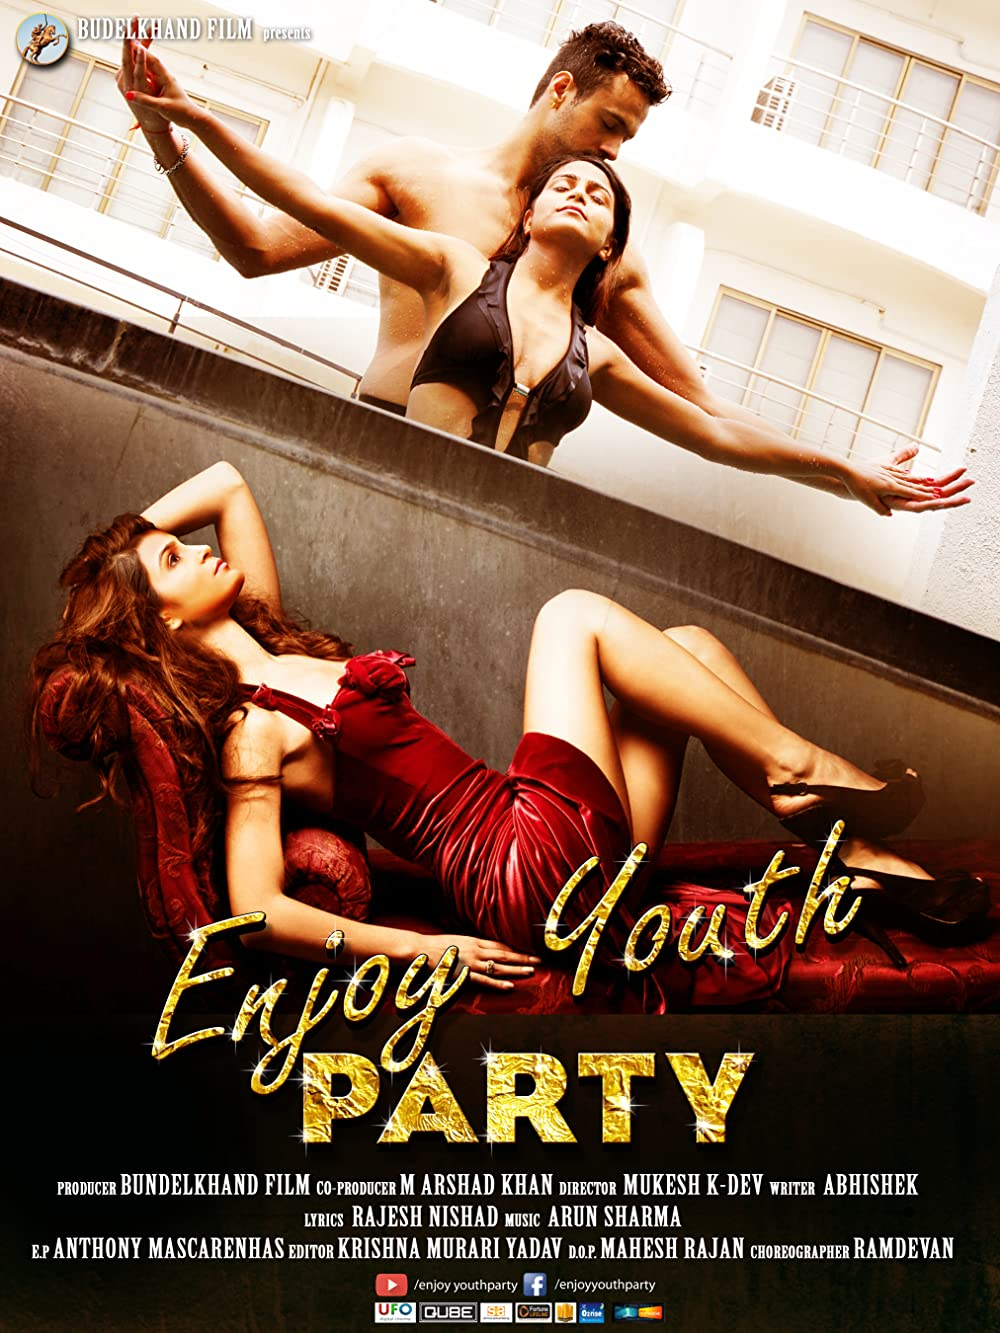 Enjoy Youth Party (2016) Hindi